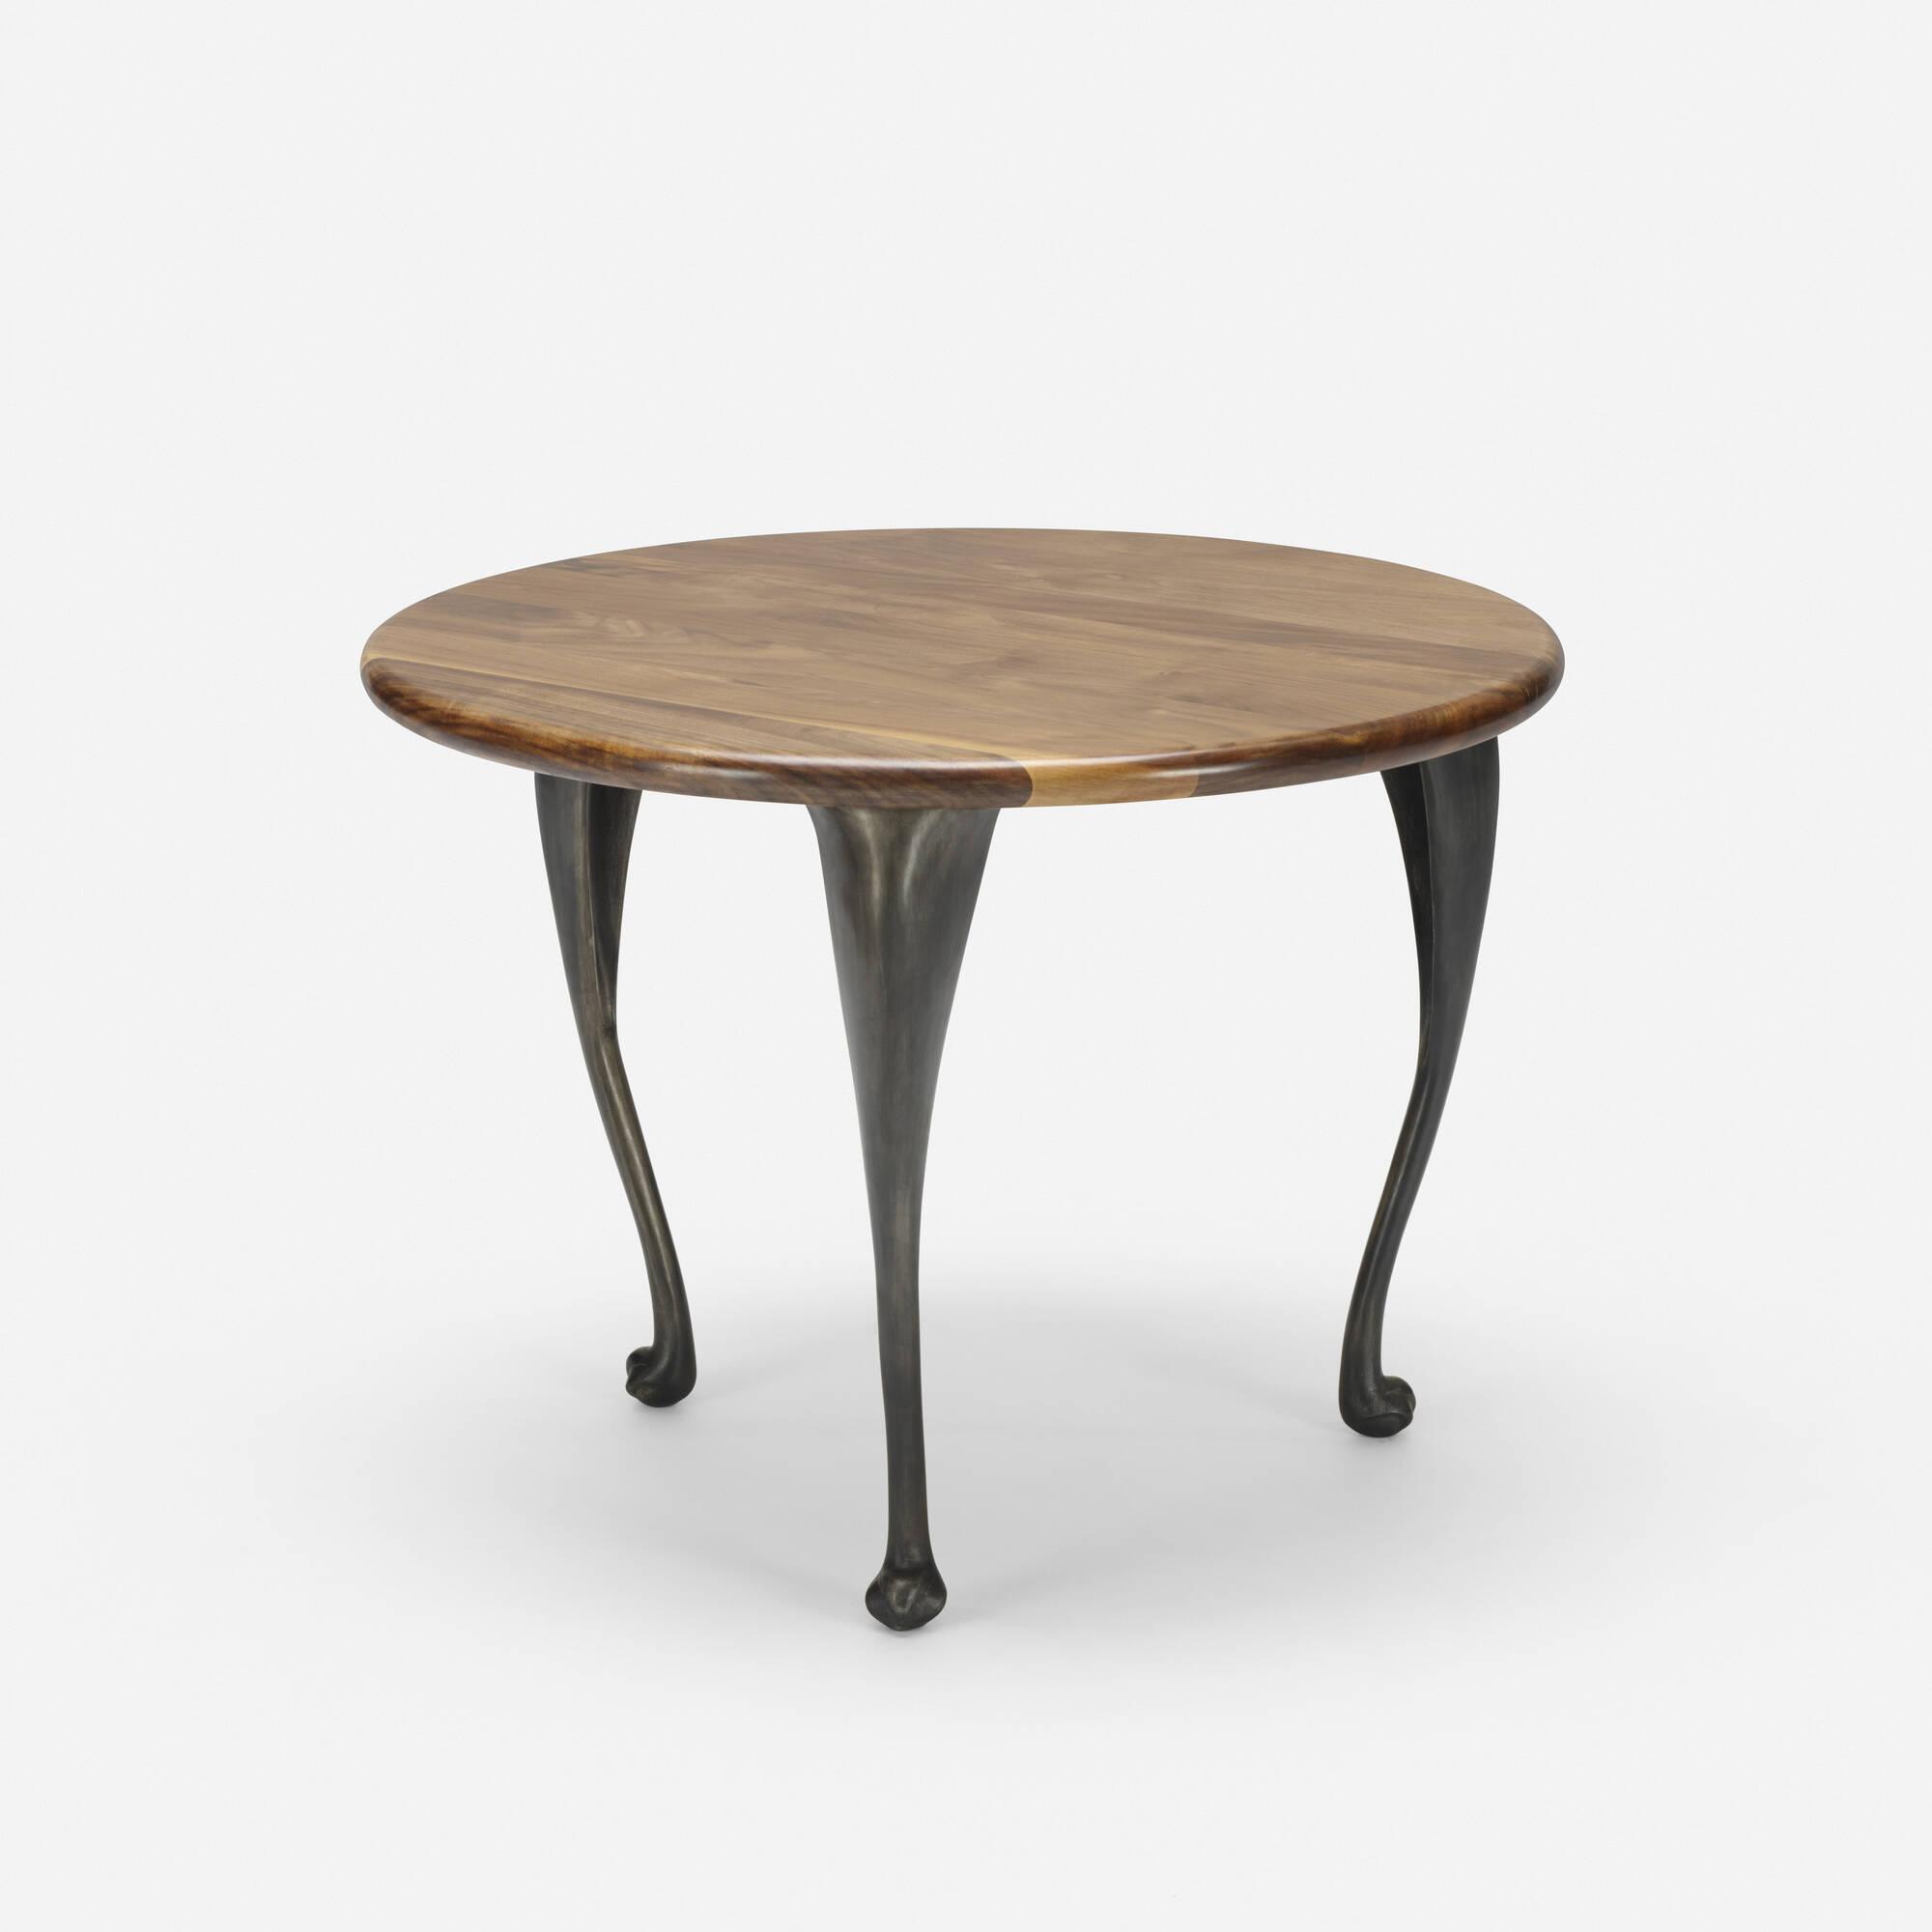 201: Jordan Mozer / Danieli coffee table (1 of 2)